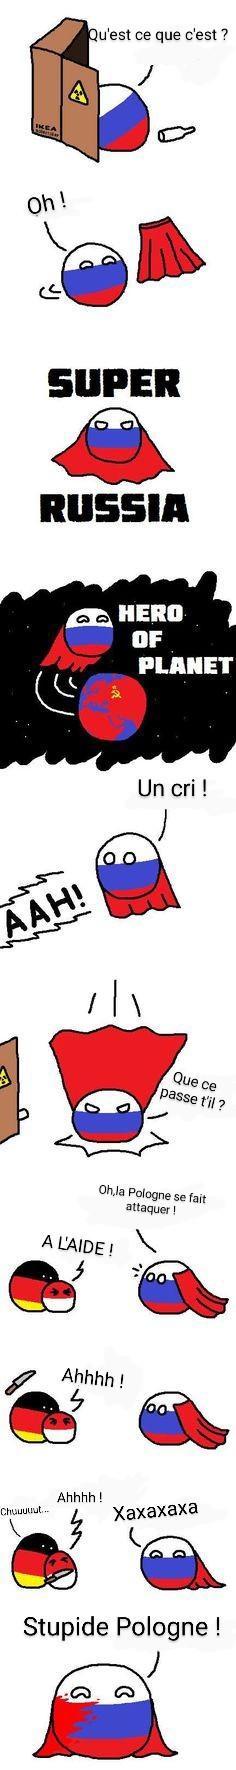 Super Russie ! - meme